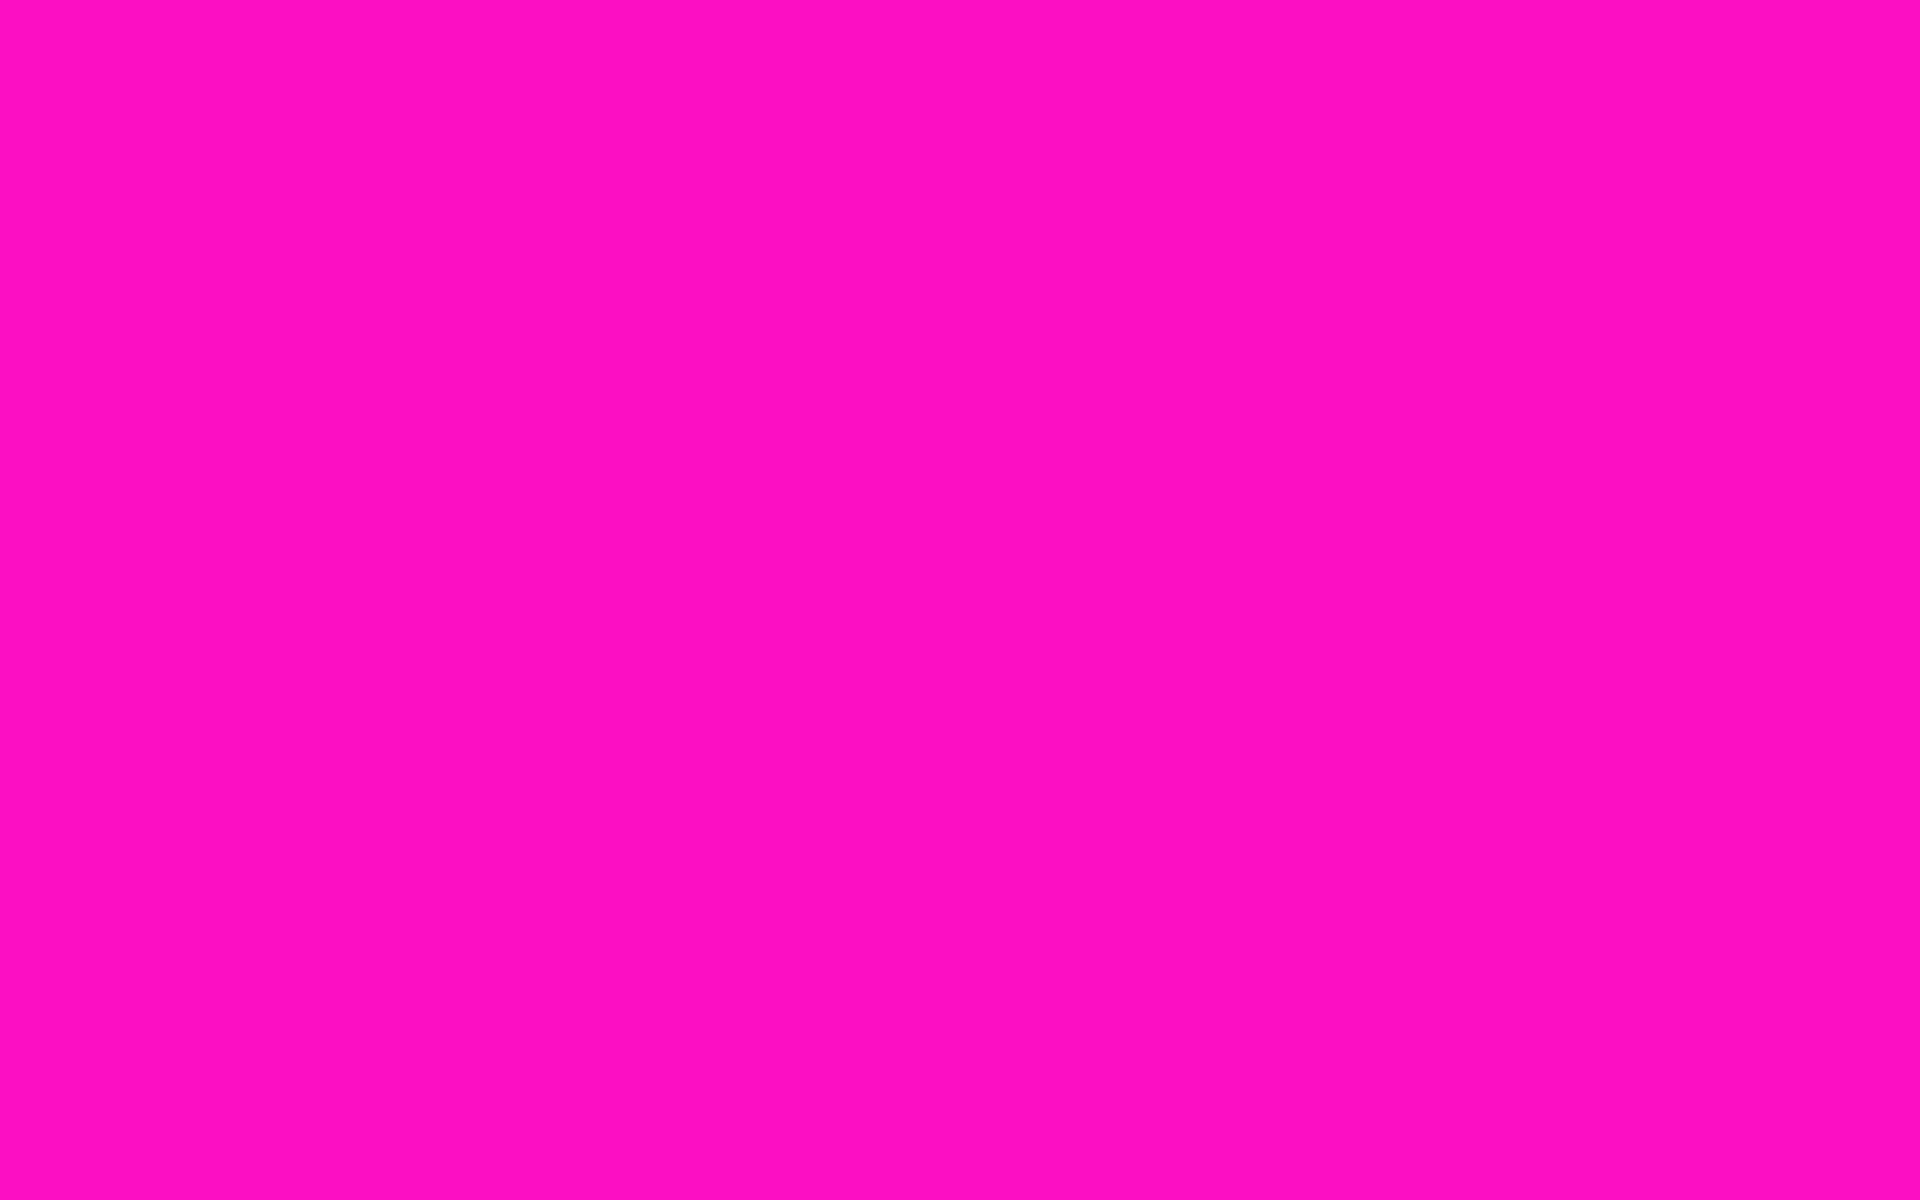 pink background color solid shocking wallpaper images 1920x1200